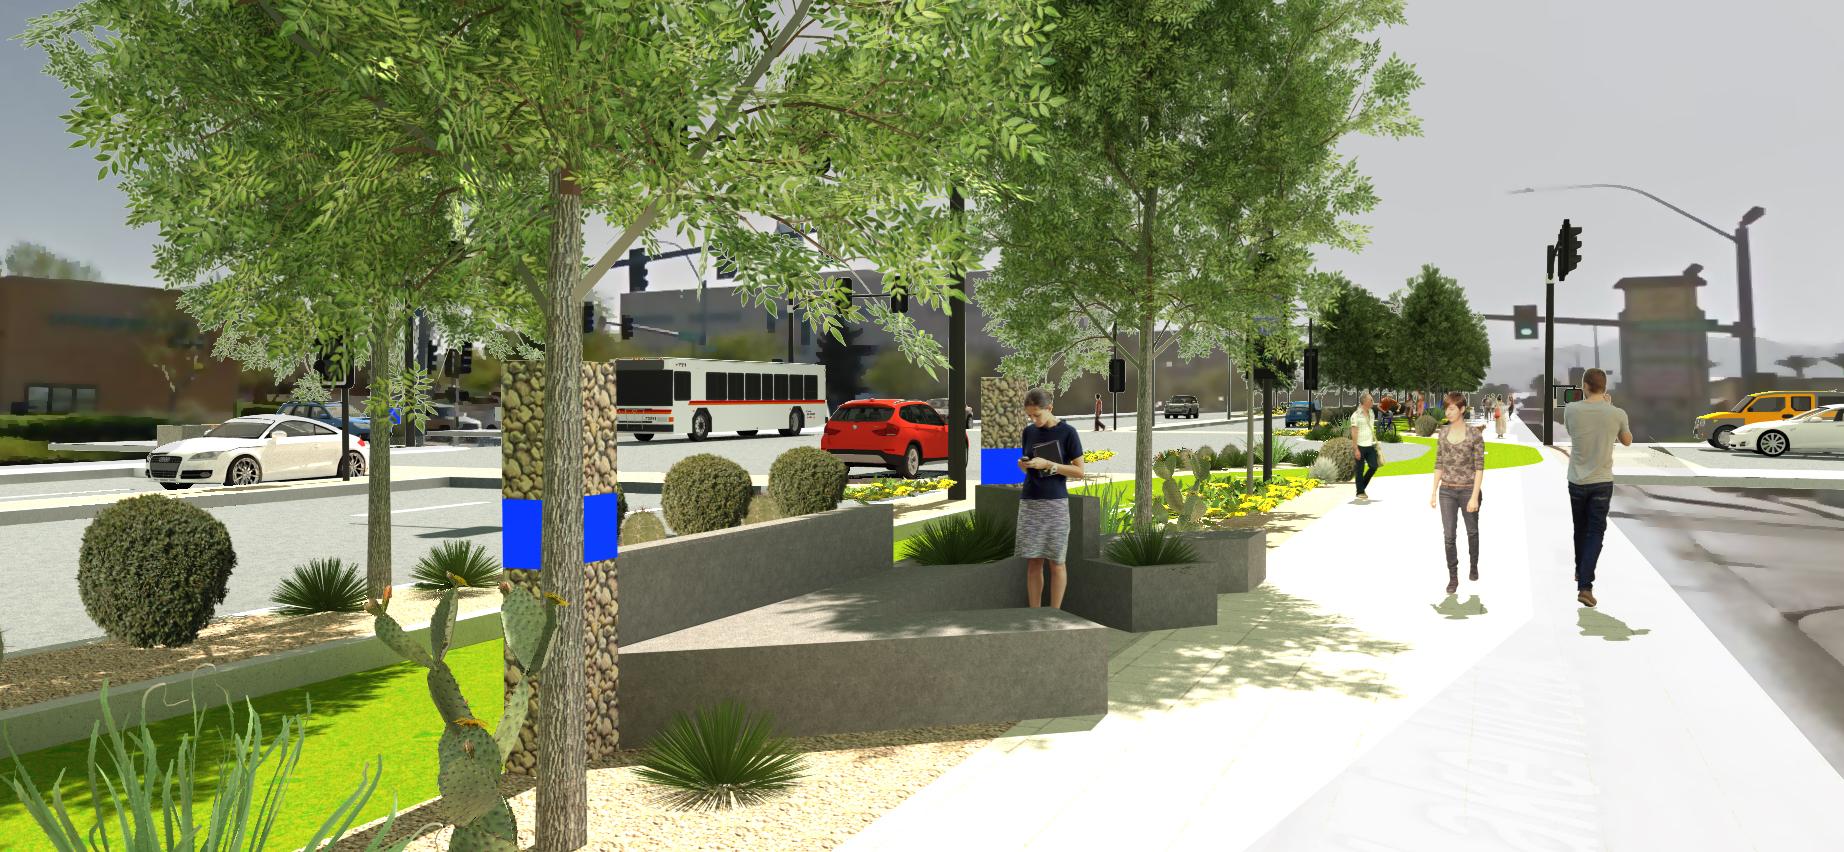 CNLV-complete-streets-lk mead mcdaniel 03